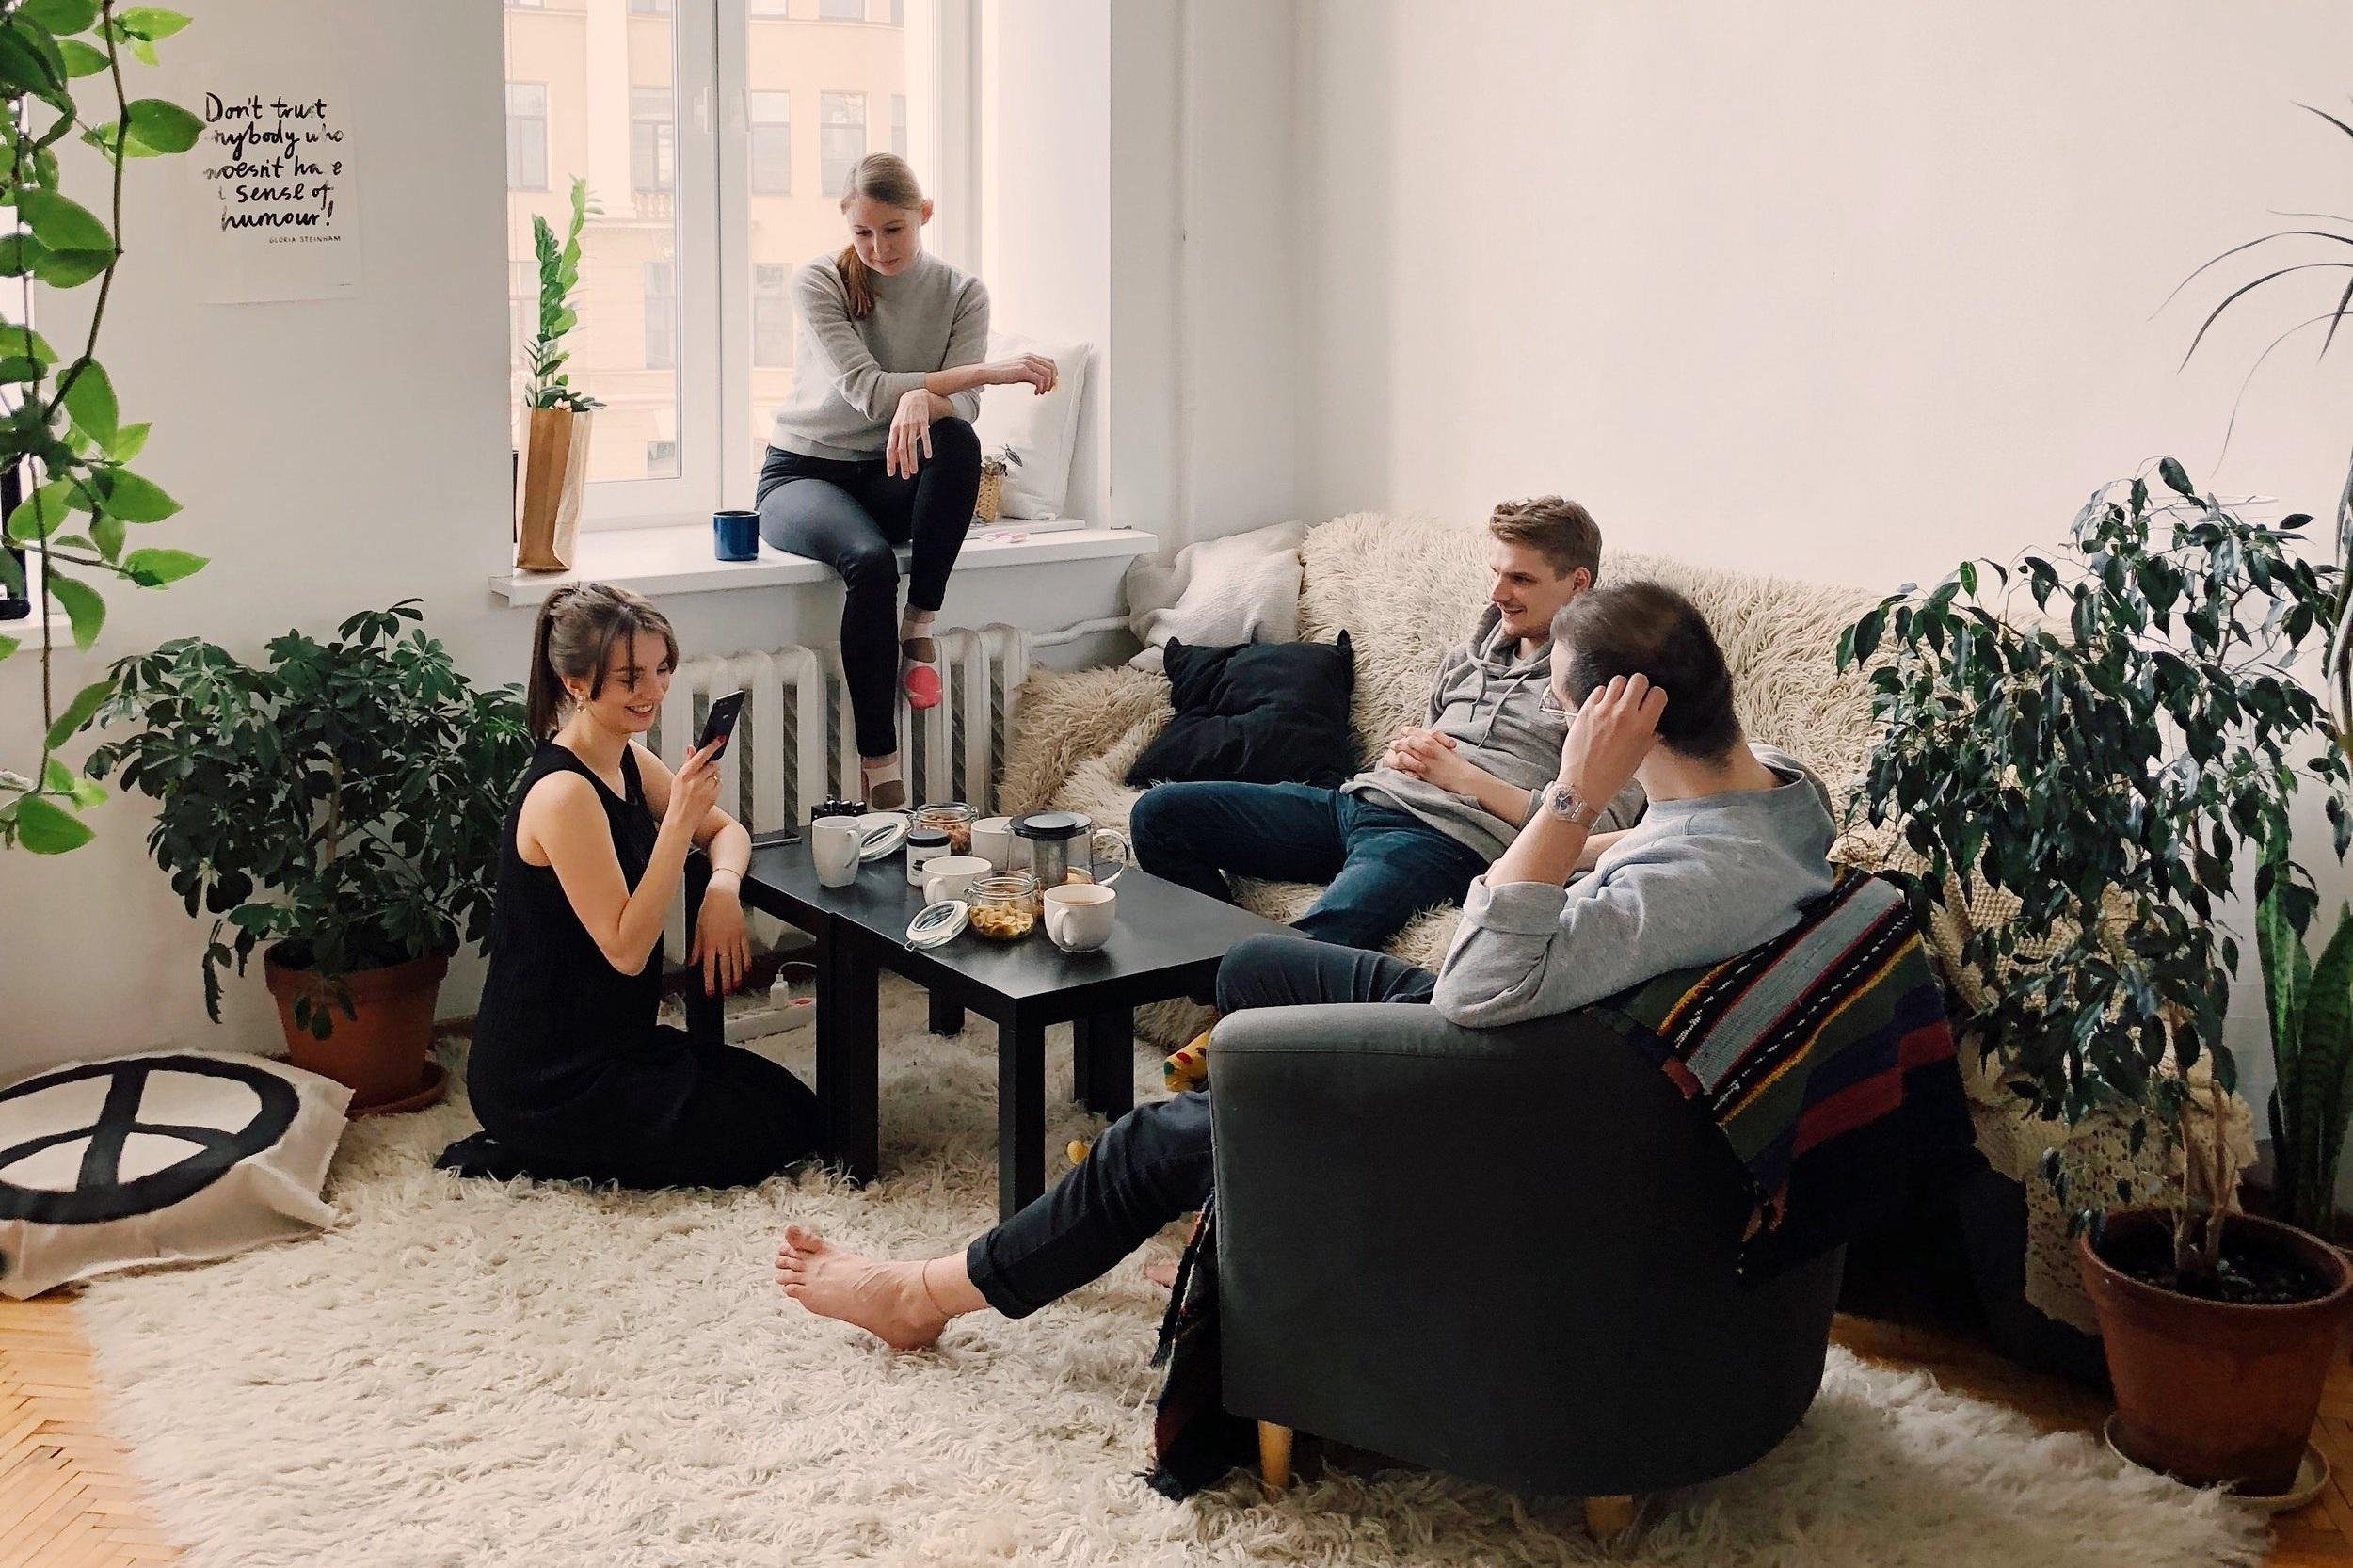 adult-apartment-carpet-1054974+%281%29.jpg